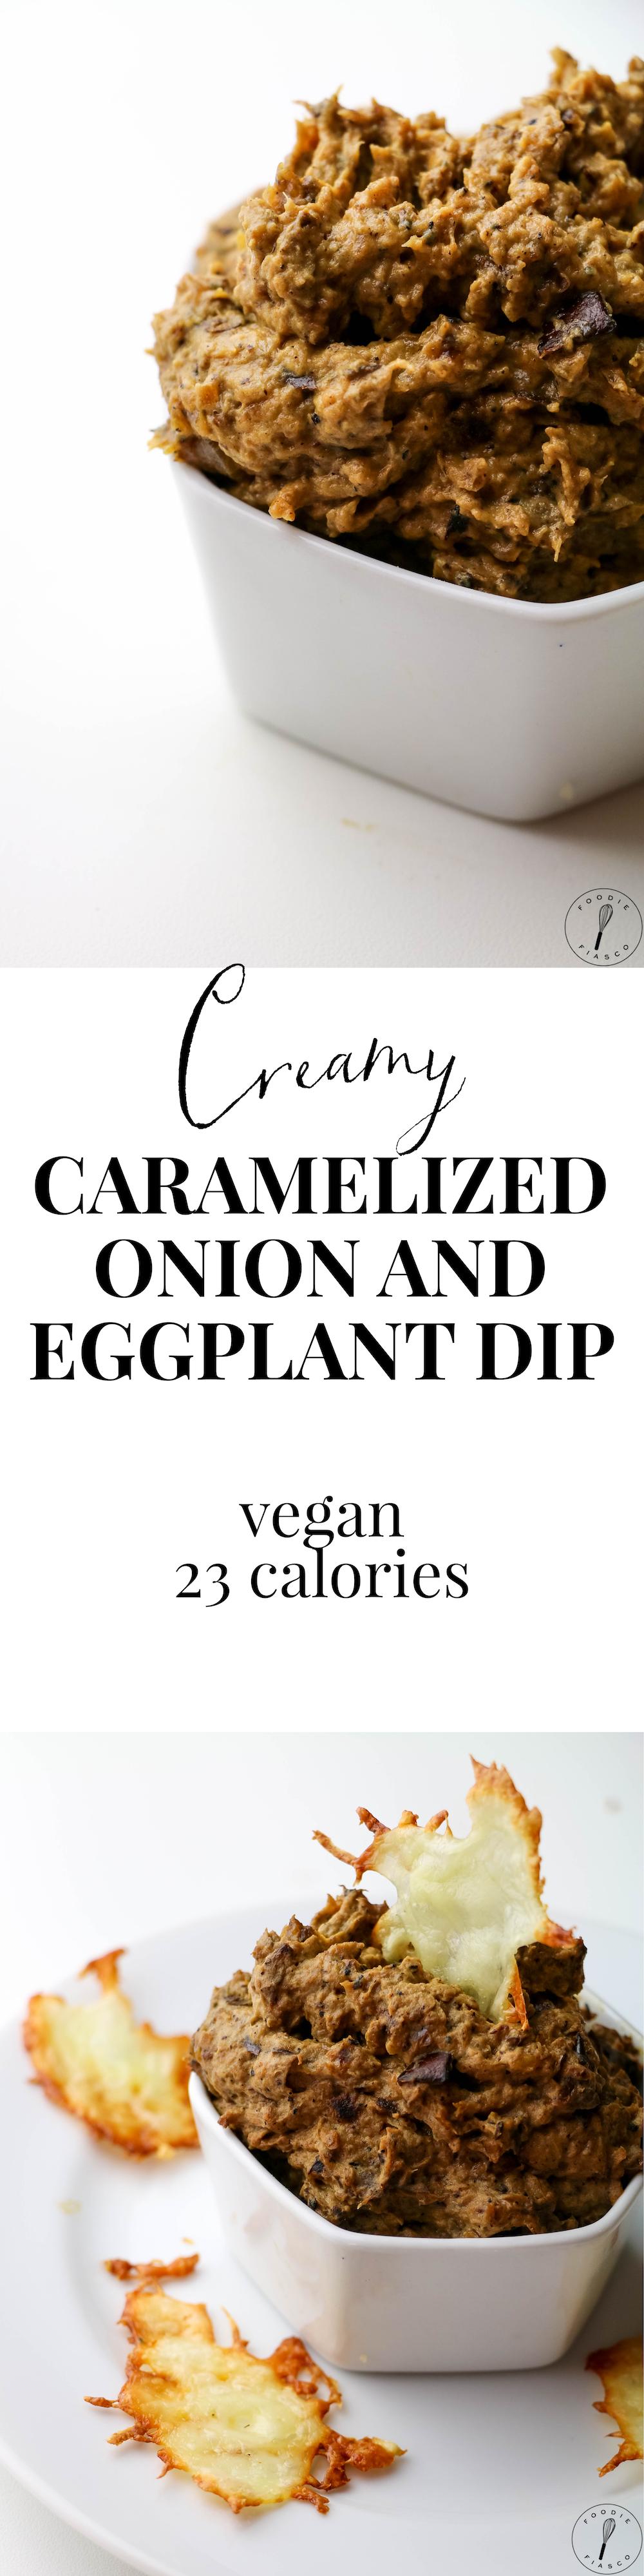 eggplant-dip-pinterest